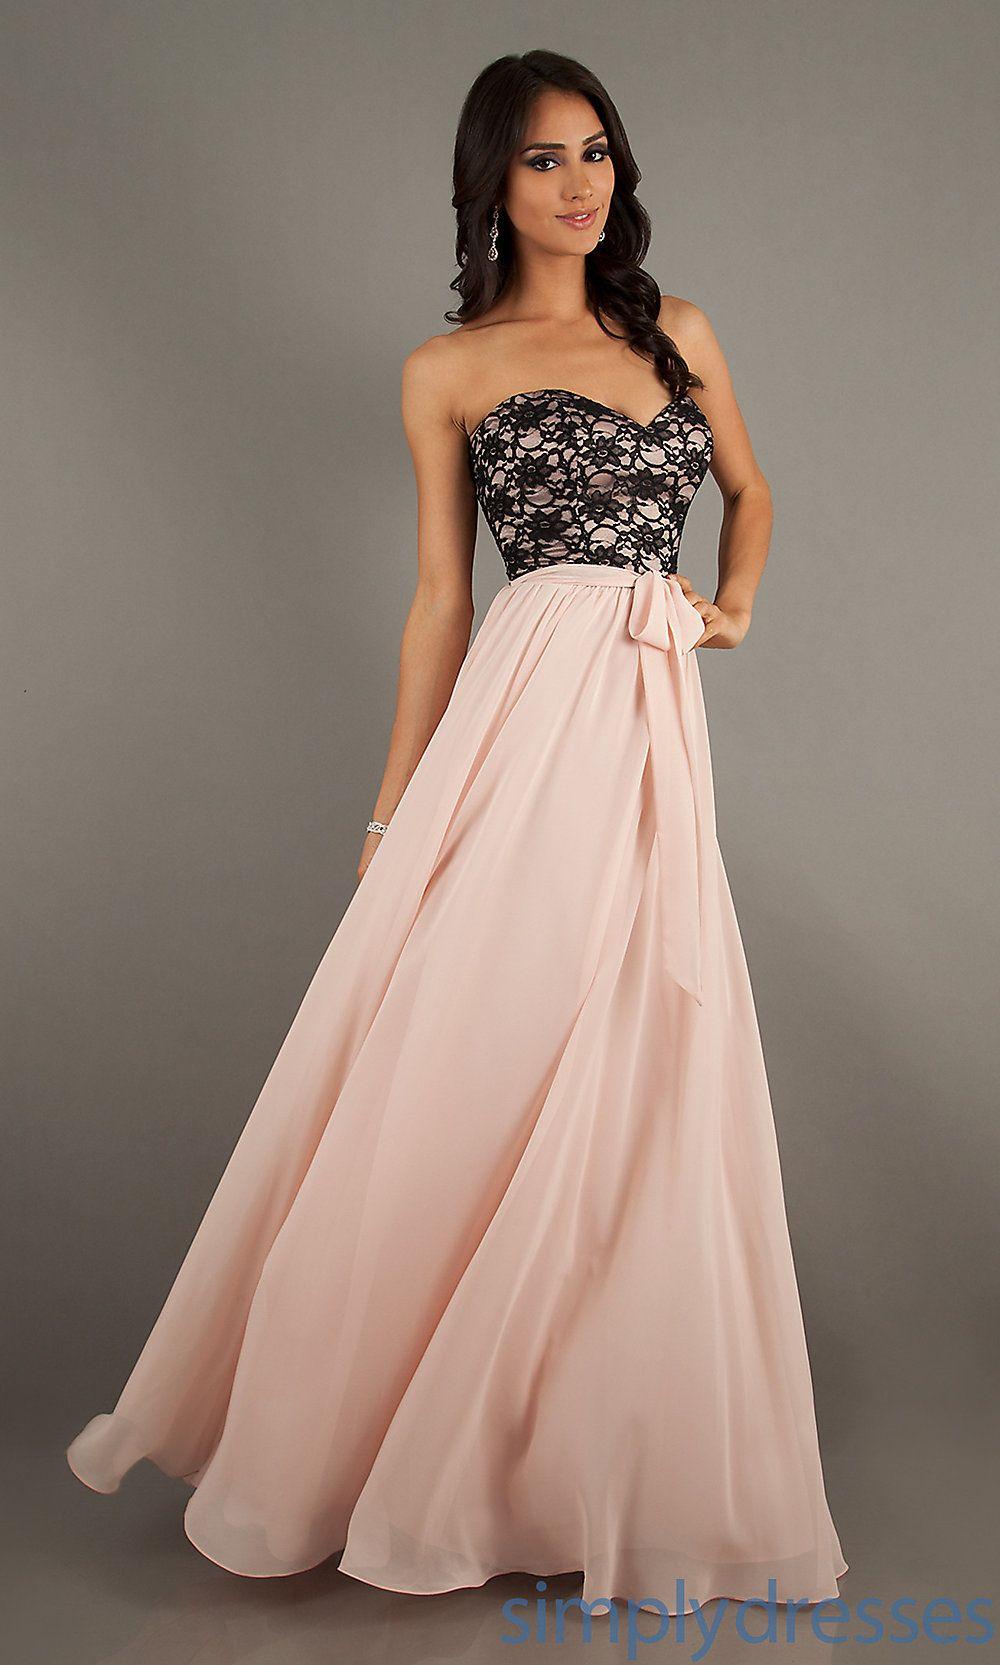 78  images about Prom dresses on Pinterest  One shoulder Pink ...